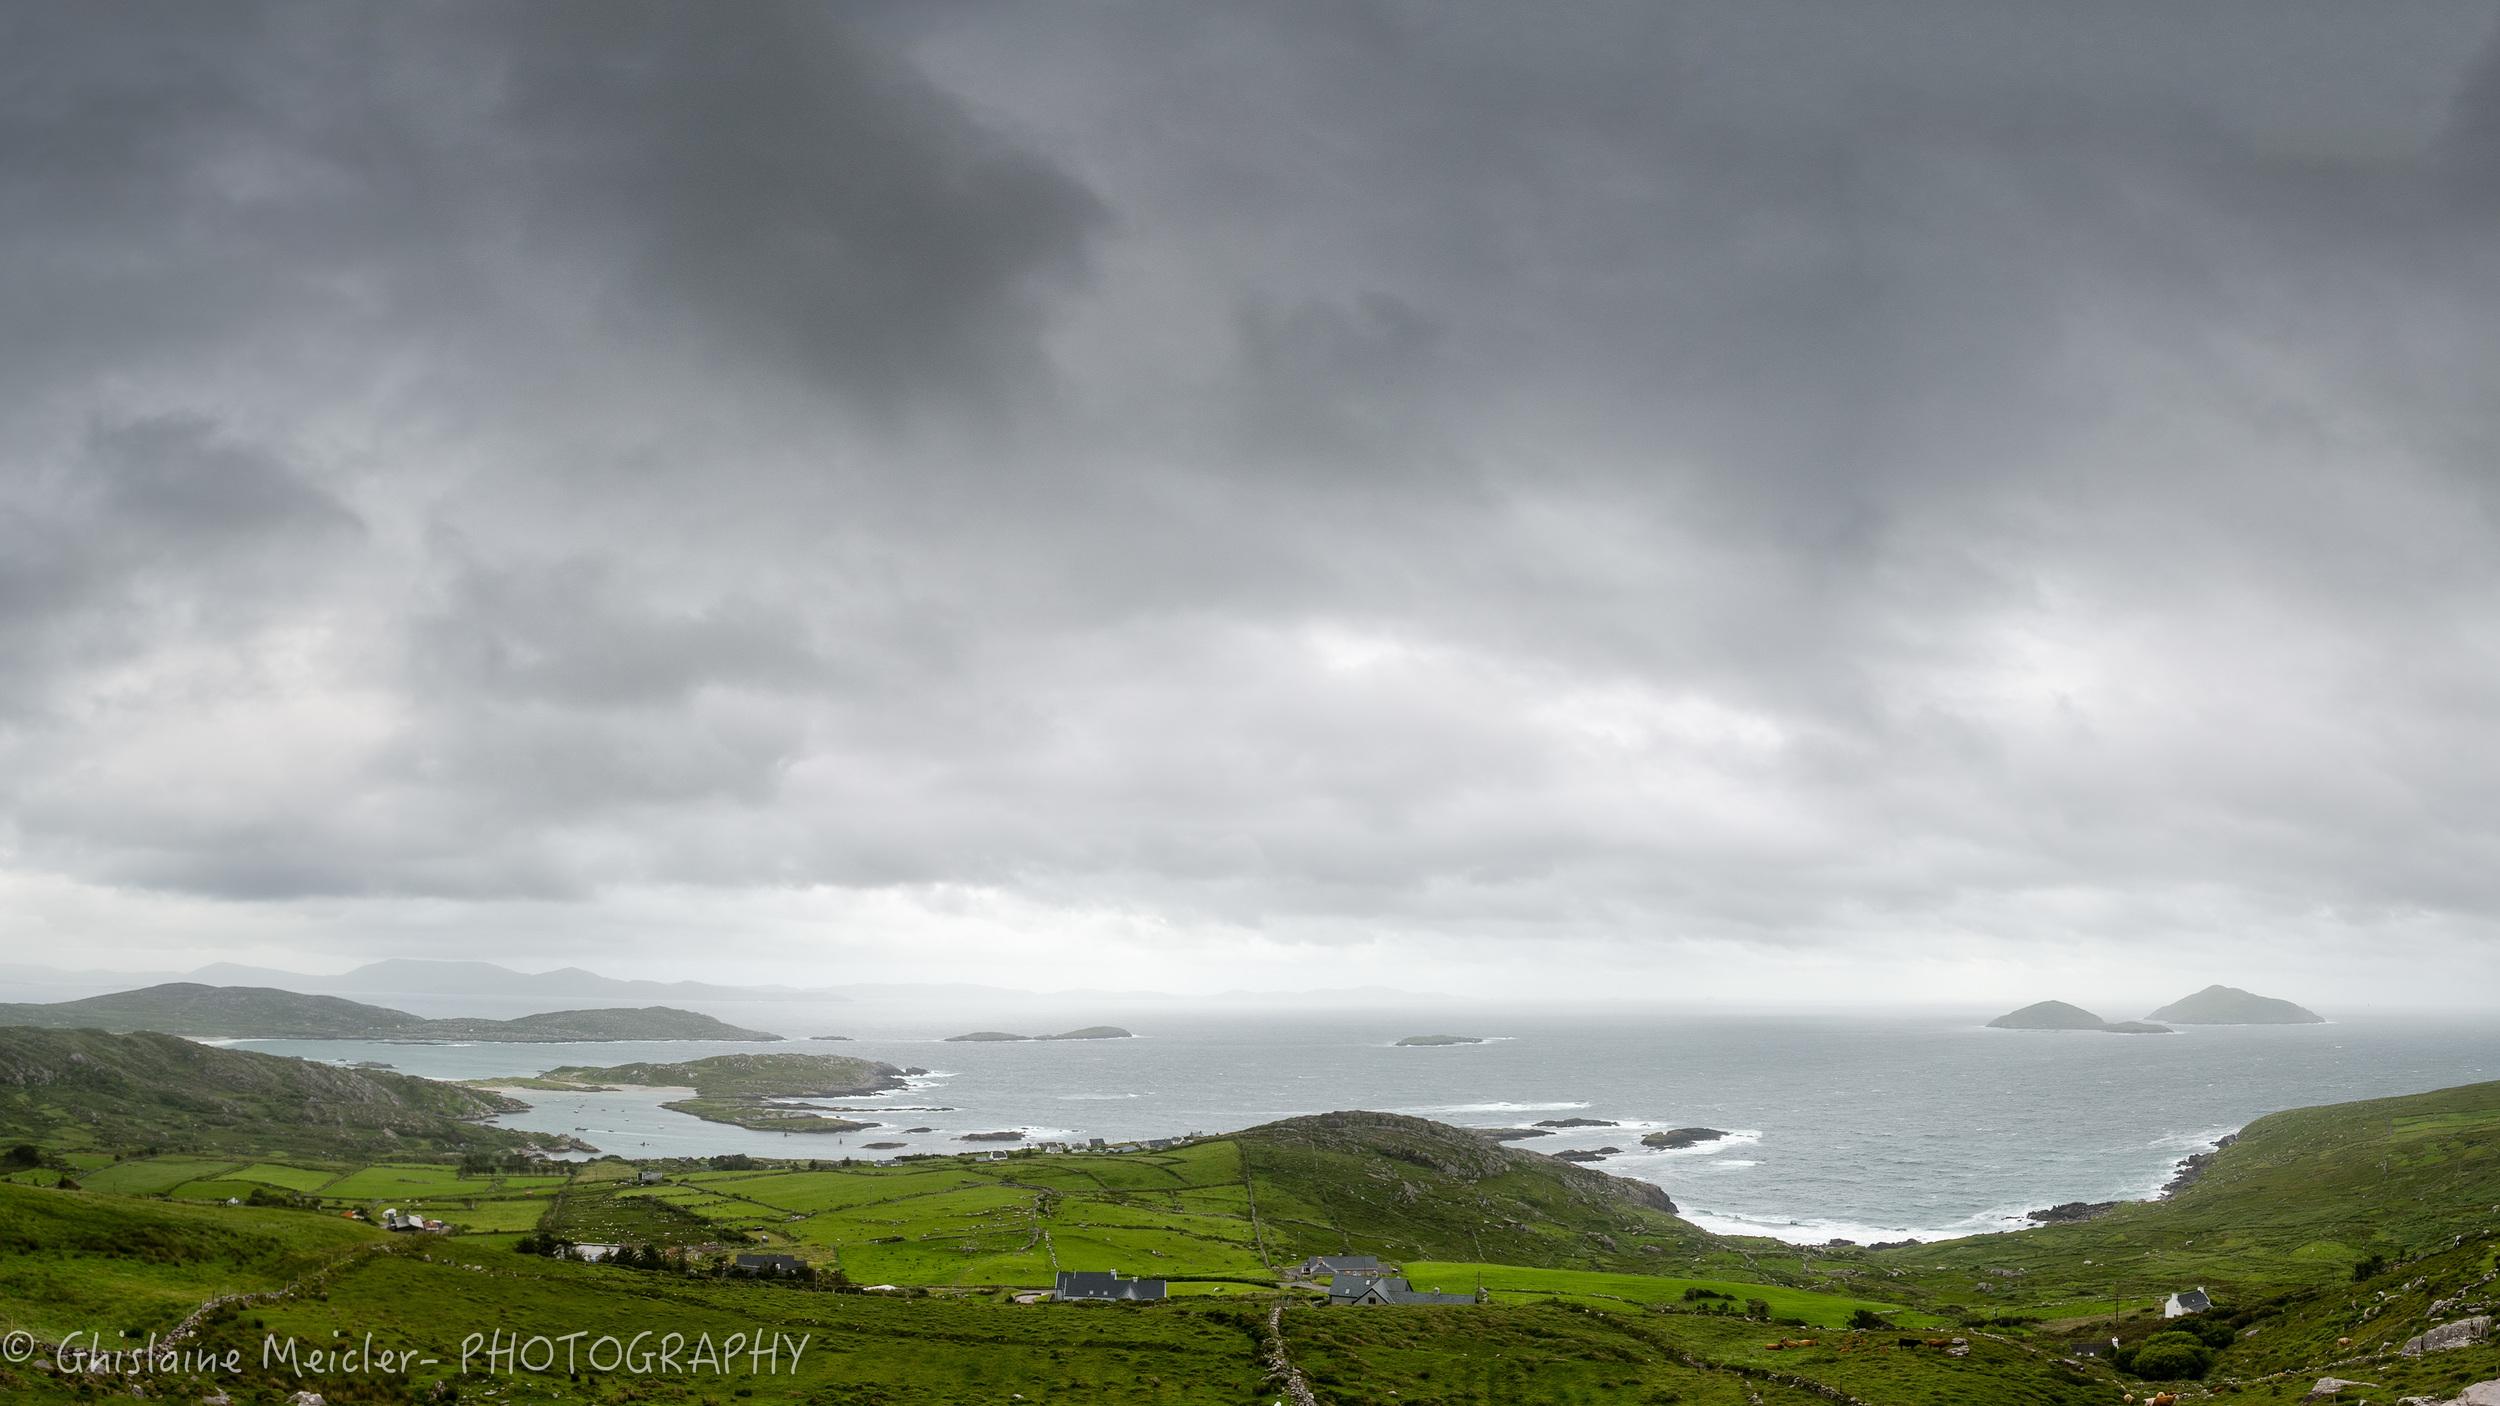 Irlande-479-Panorama-3-Modifier.jpg